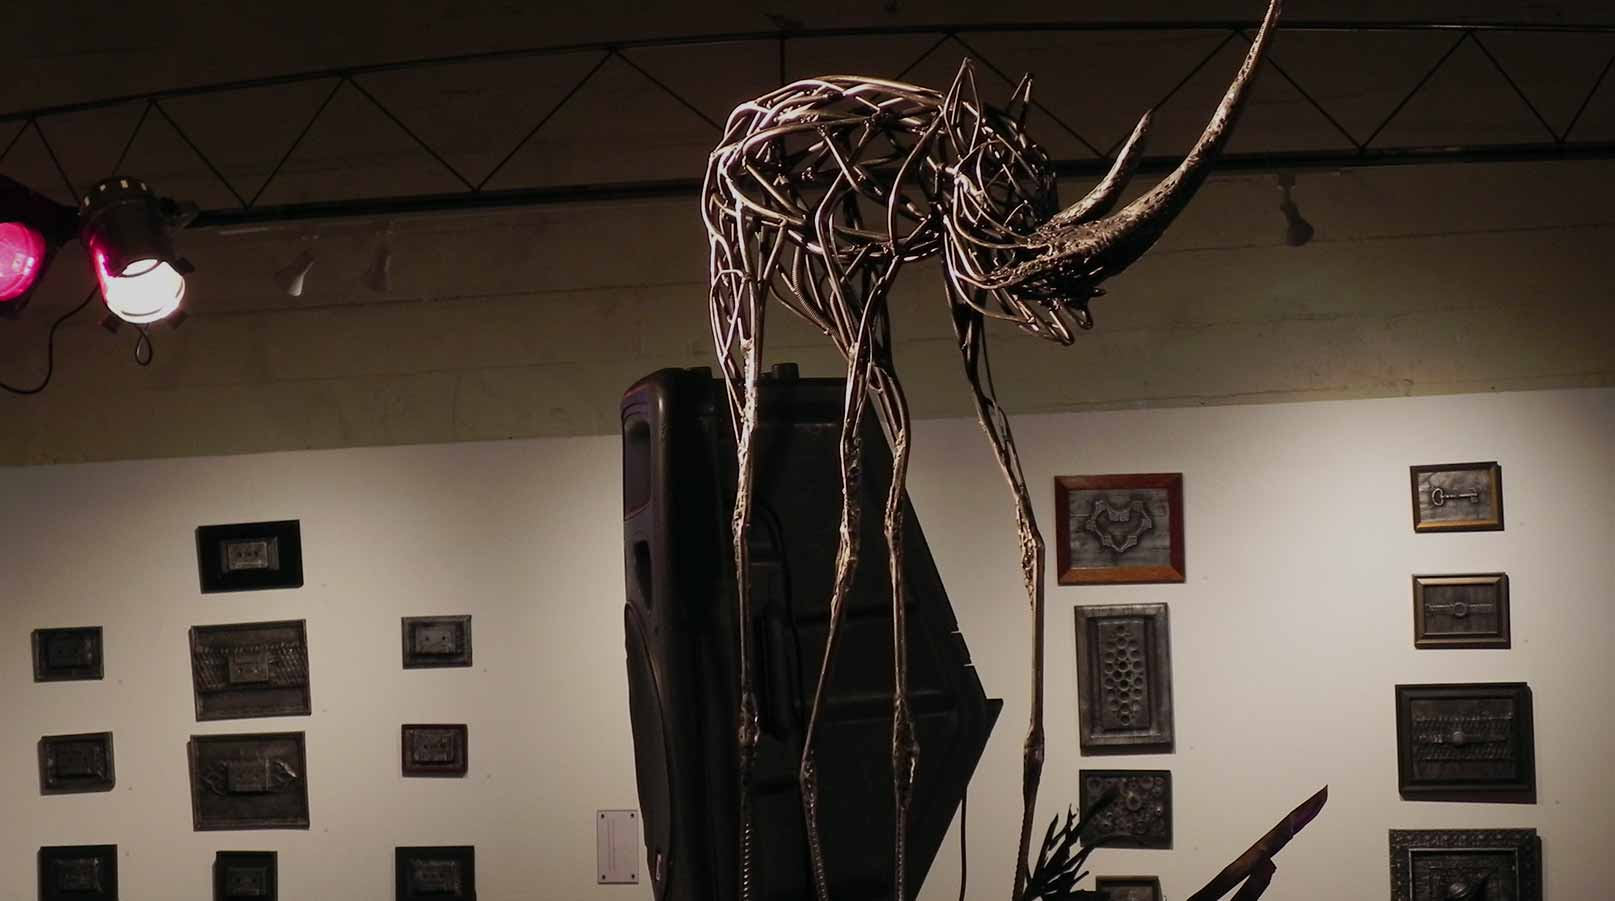 Salvador Dali Sculpture by Truax Designs